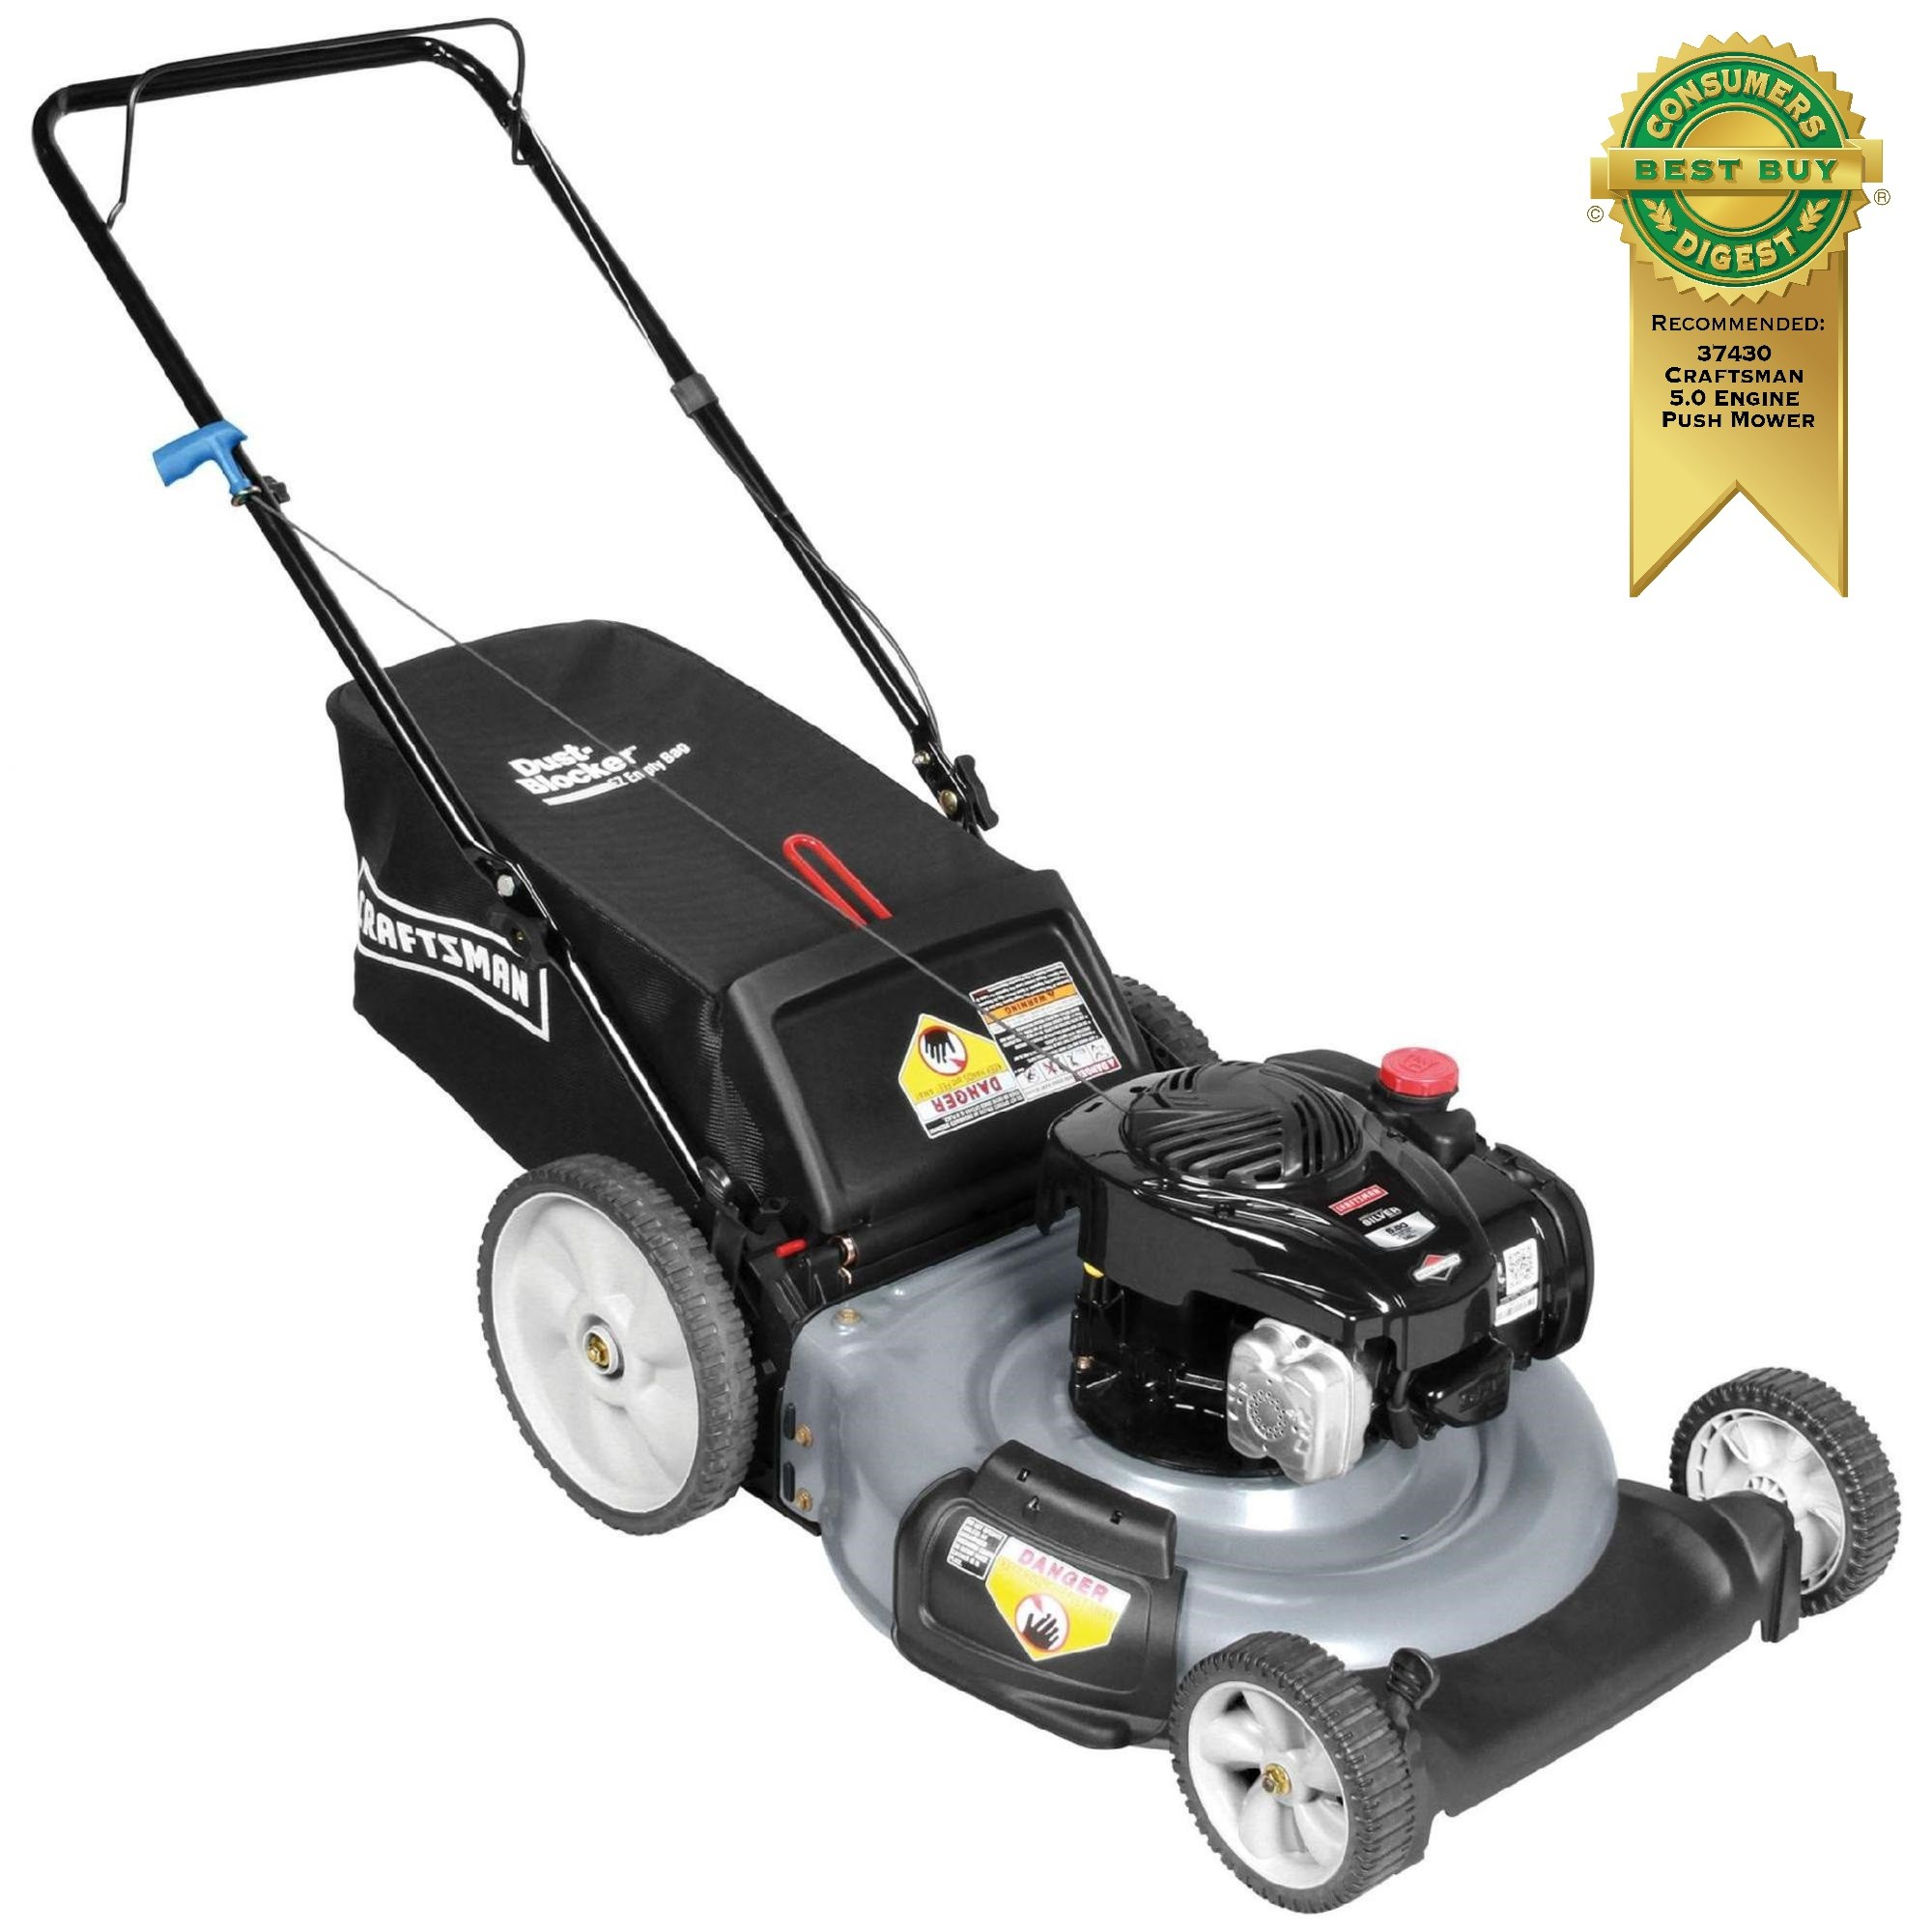 "Honda Lawn Mower Engine Diagram Craftsman 21"" 140cc Briggs & Stratton 3 In 1 Push Mower with Of Honda Lawn Mower Engine Diagram"